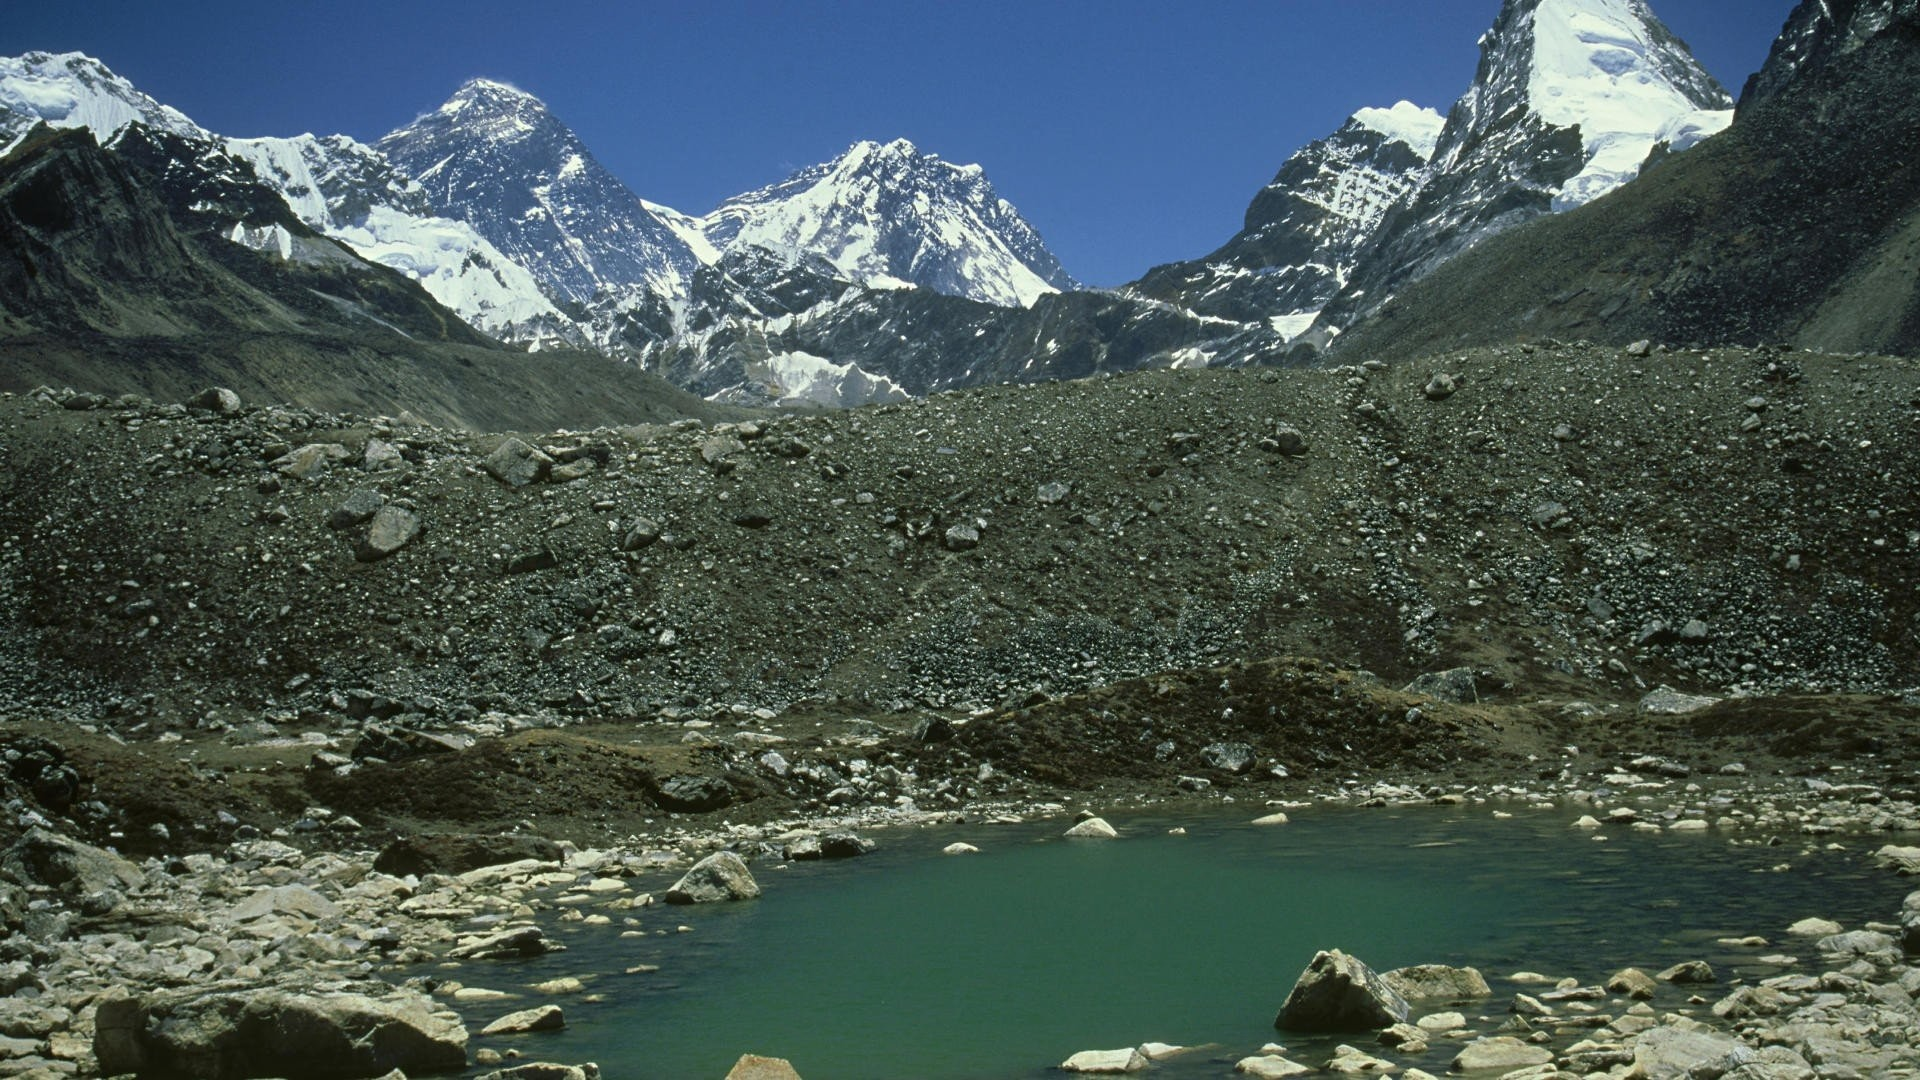 Mountains landscapes Nepal National Park Mount Everest wallpaper |  | 254208 | WallpaperUP